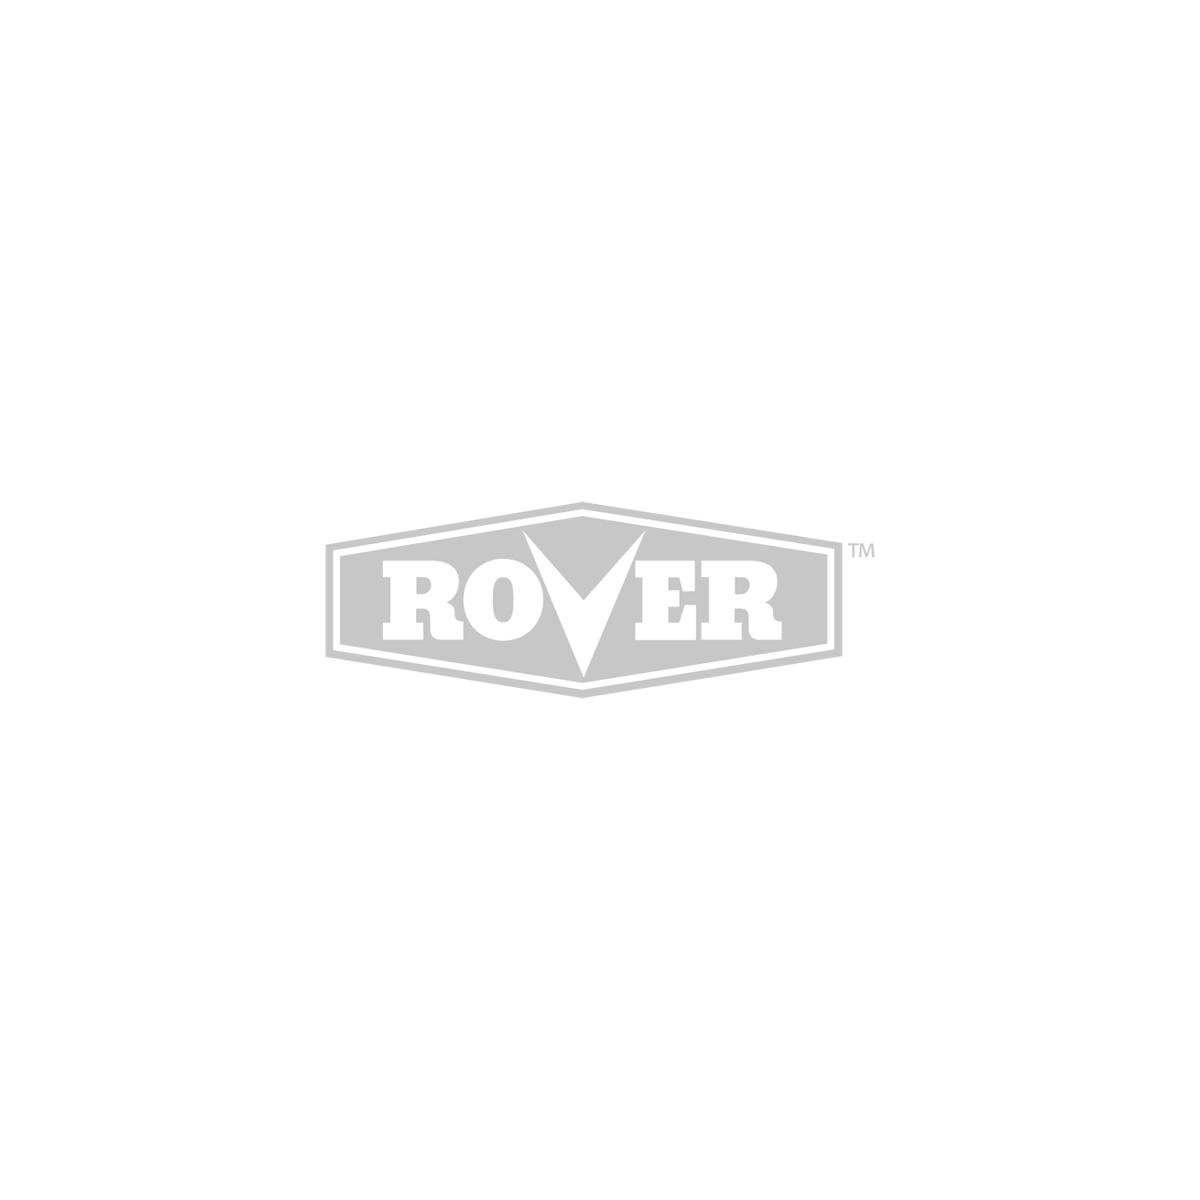 E-Coat Automotive grade corrosion resistance